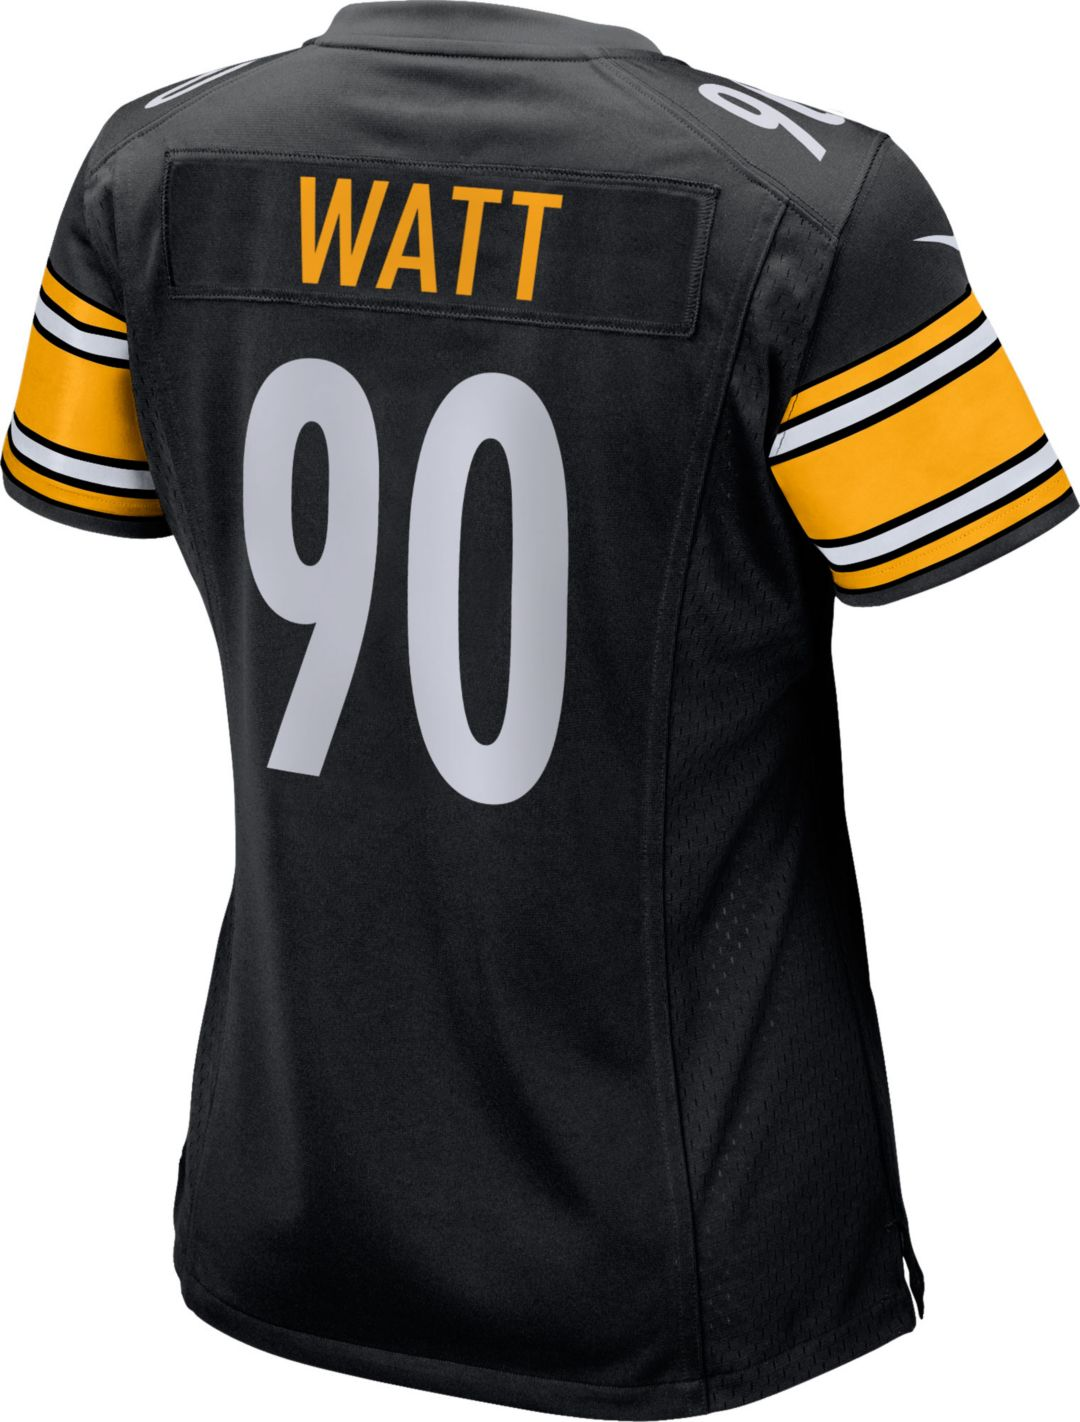 super popular eae5a 07915 Nike Women's Home Game Jersey Pittsburgh Steelers T.J. Watt #90